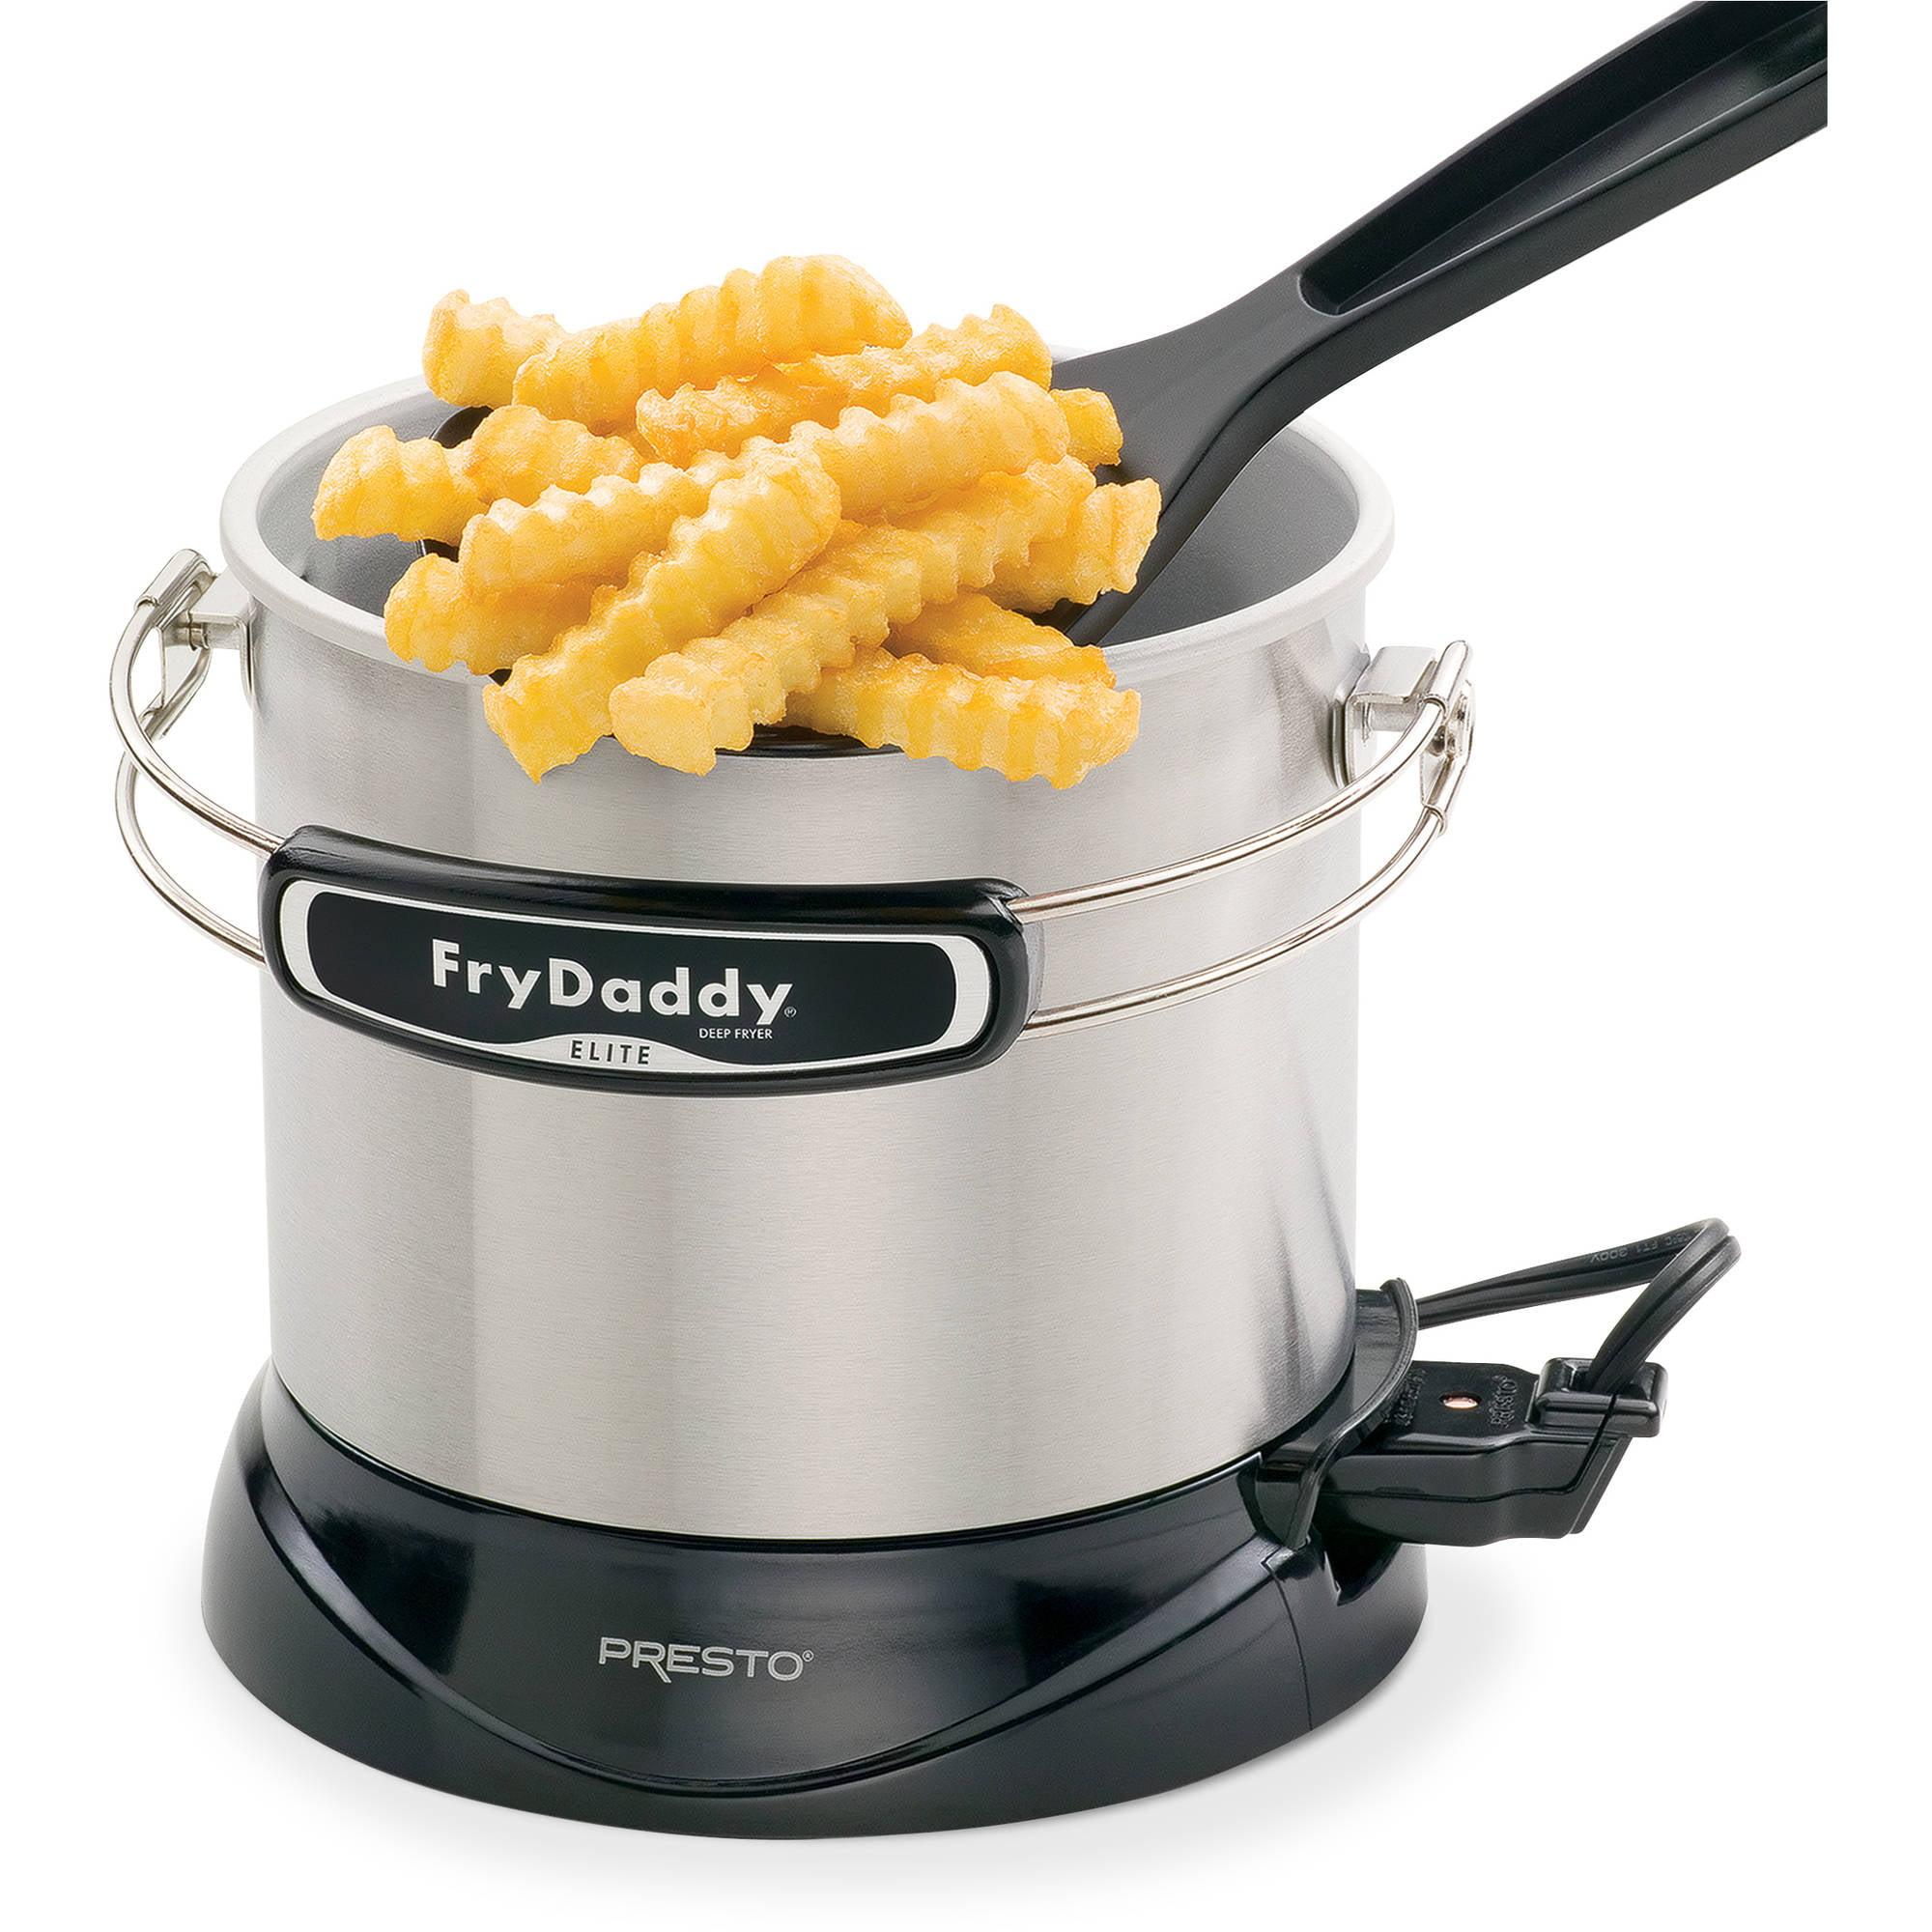 Farberware Deep Fryers